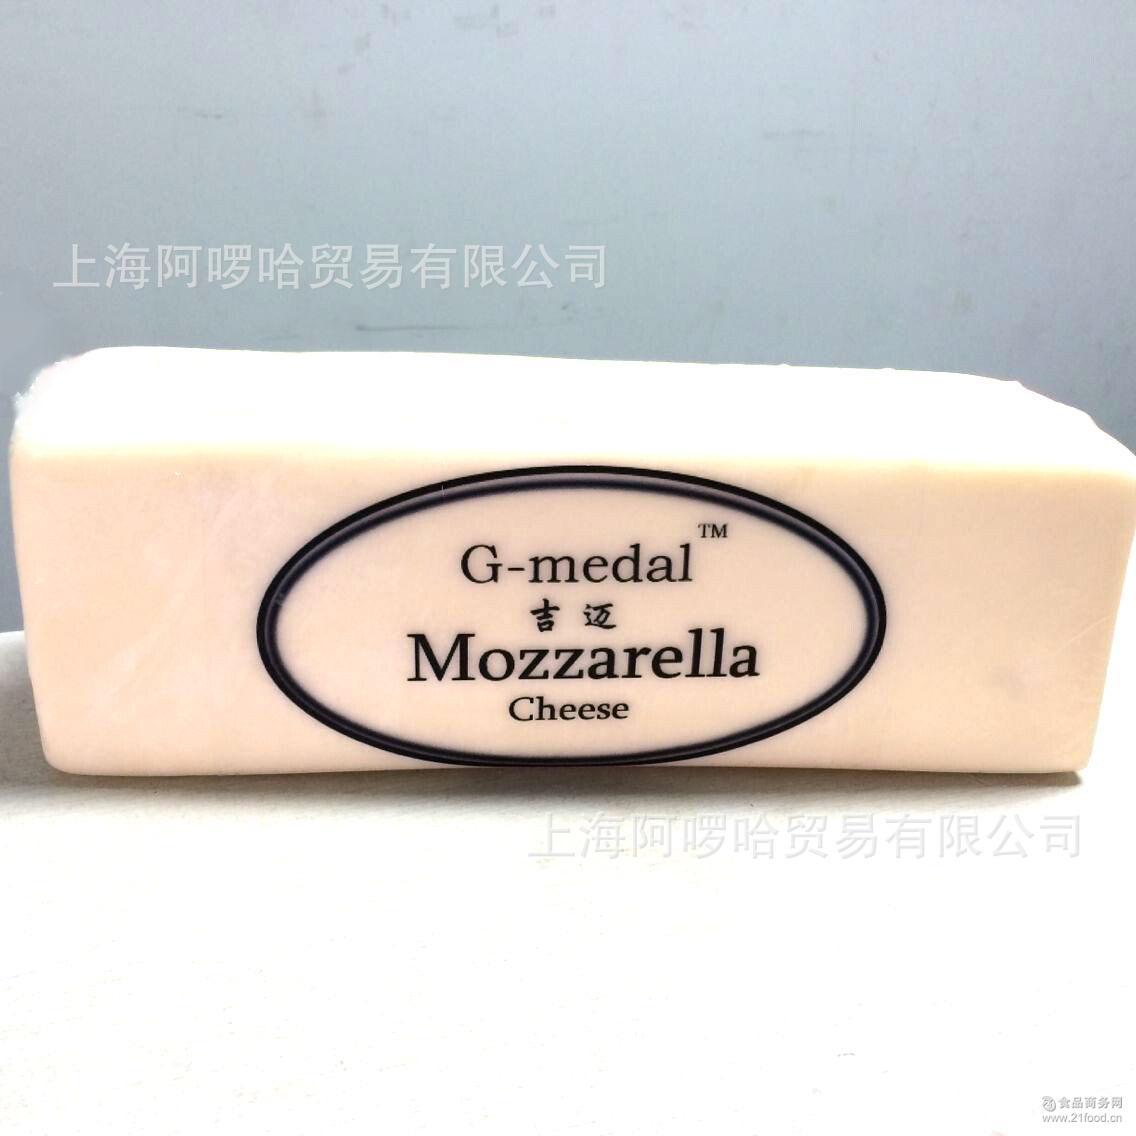 G-medal吉迈 披萨芝士/拉丝极好 3kg美国进口优质马苏里拉奶酪